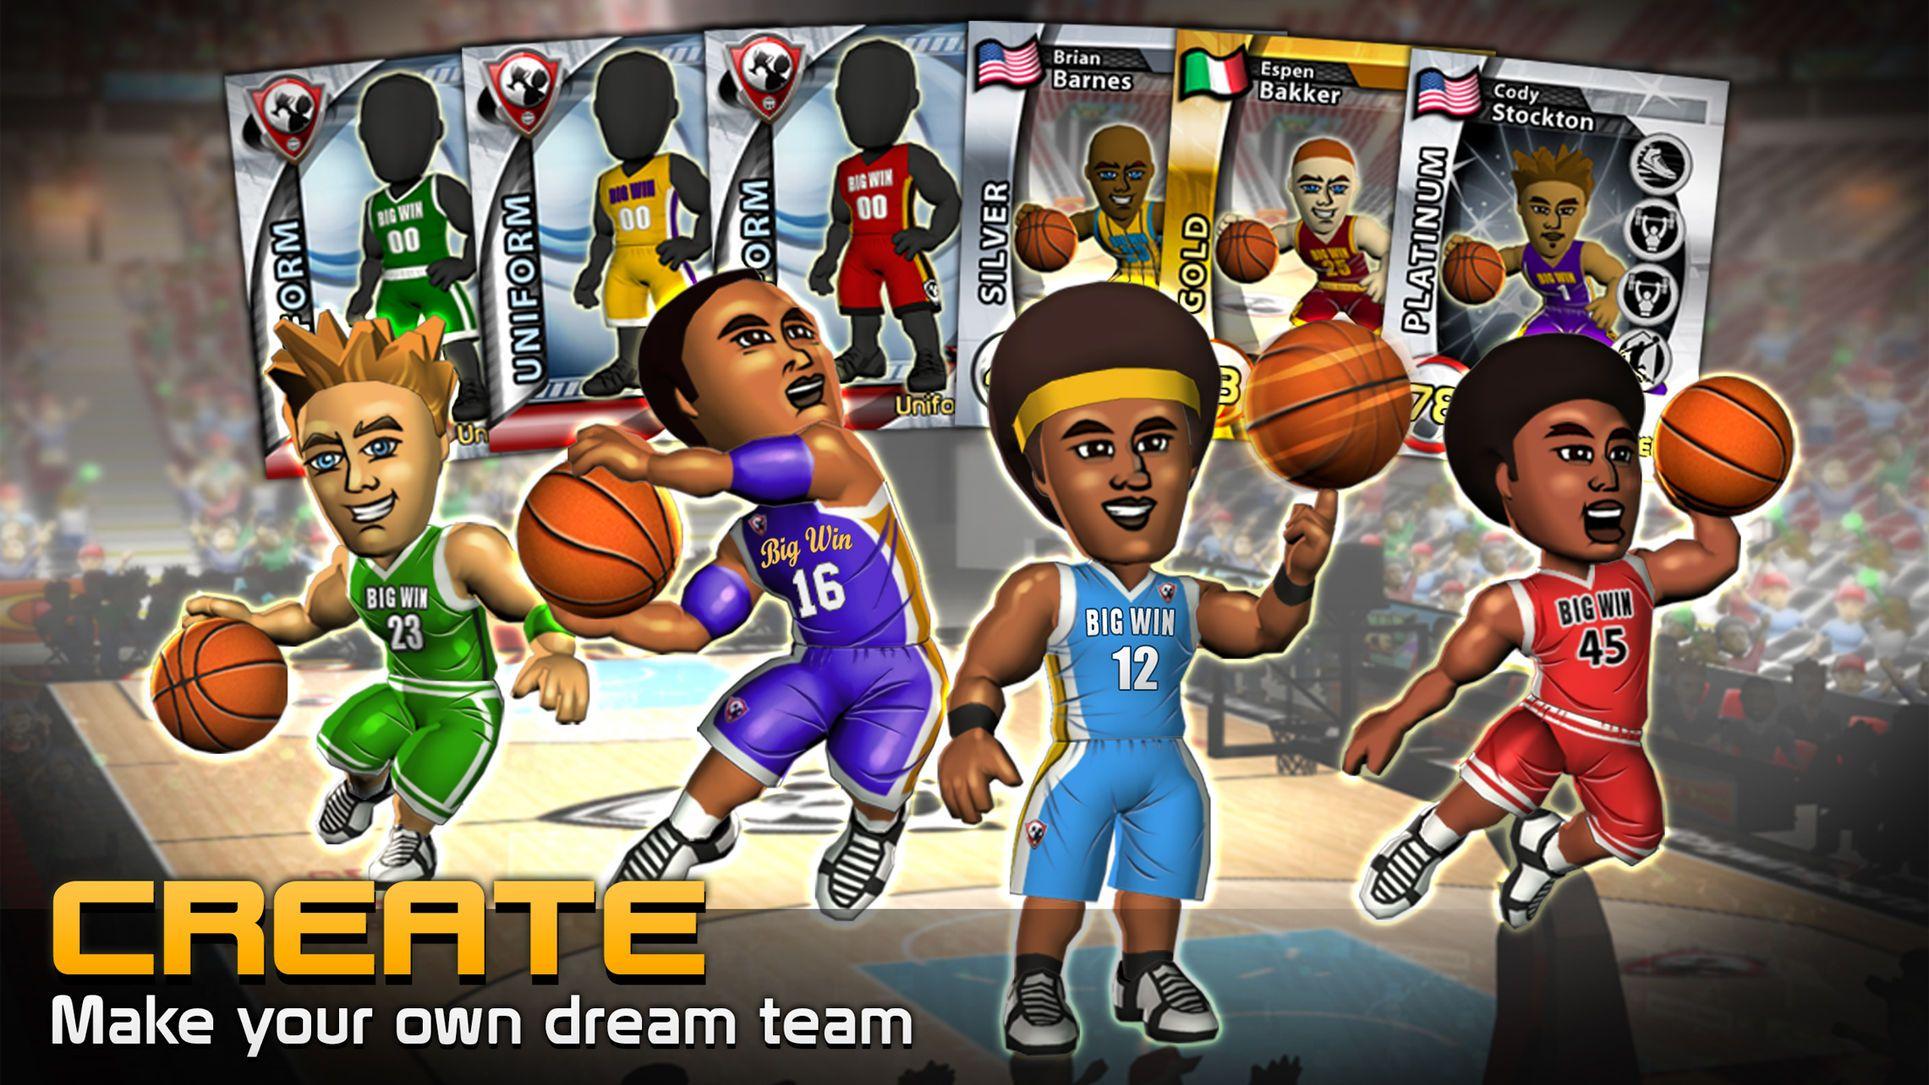 Big win basketball rolesportsiosplaying com games